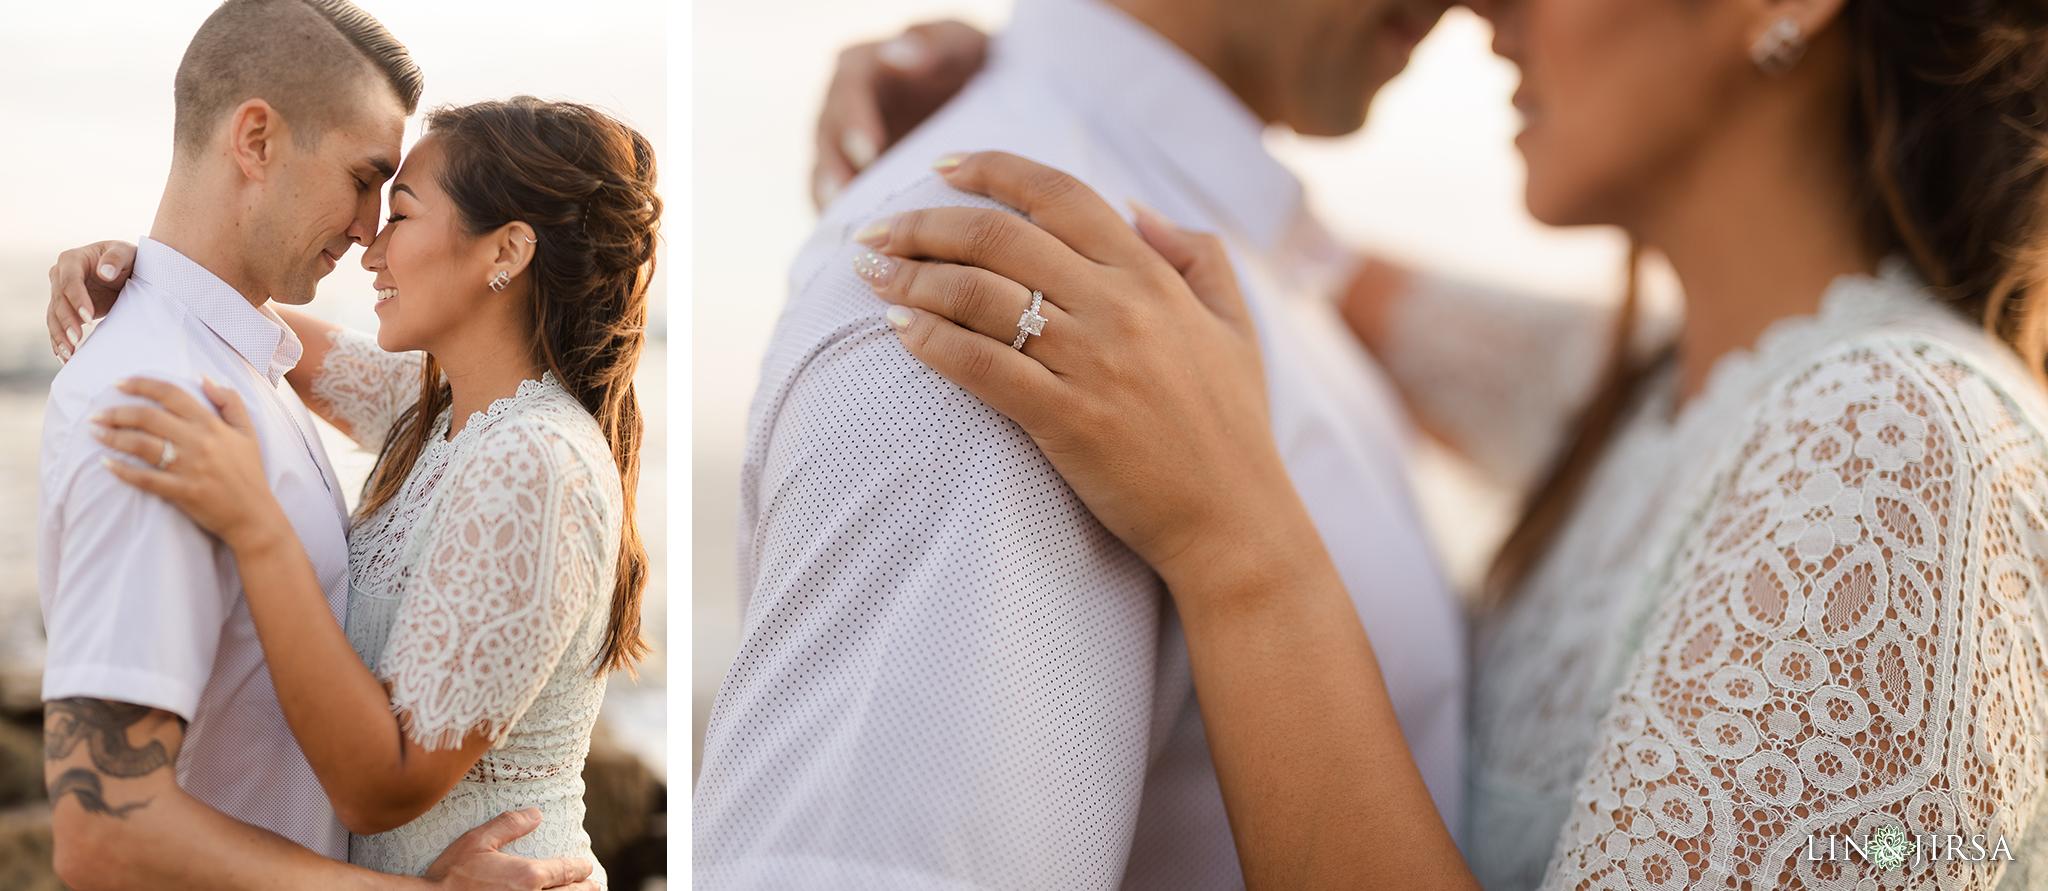 19 Heisler Beach Orange County Engagement Photography